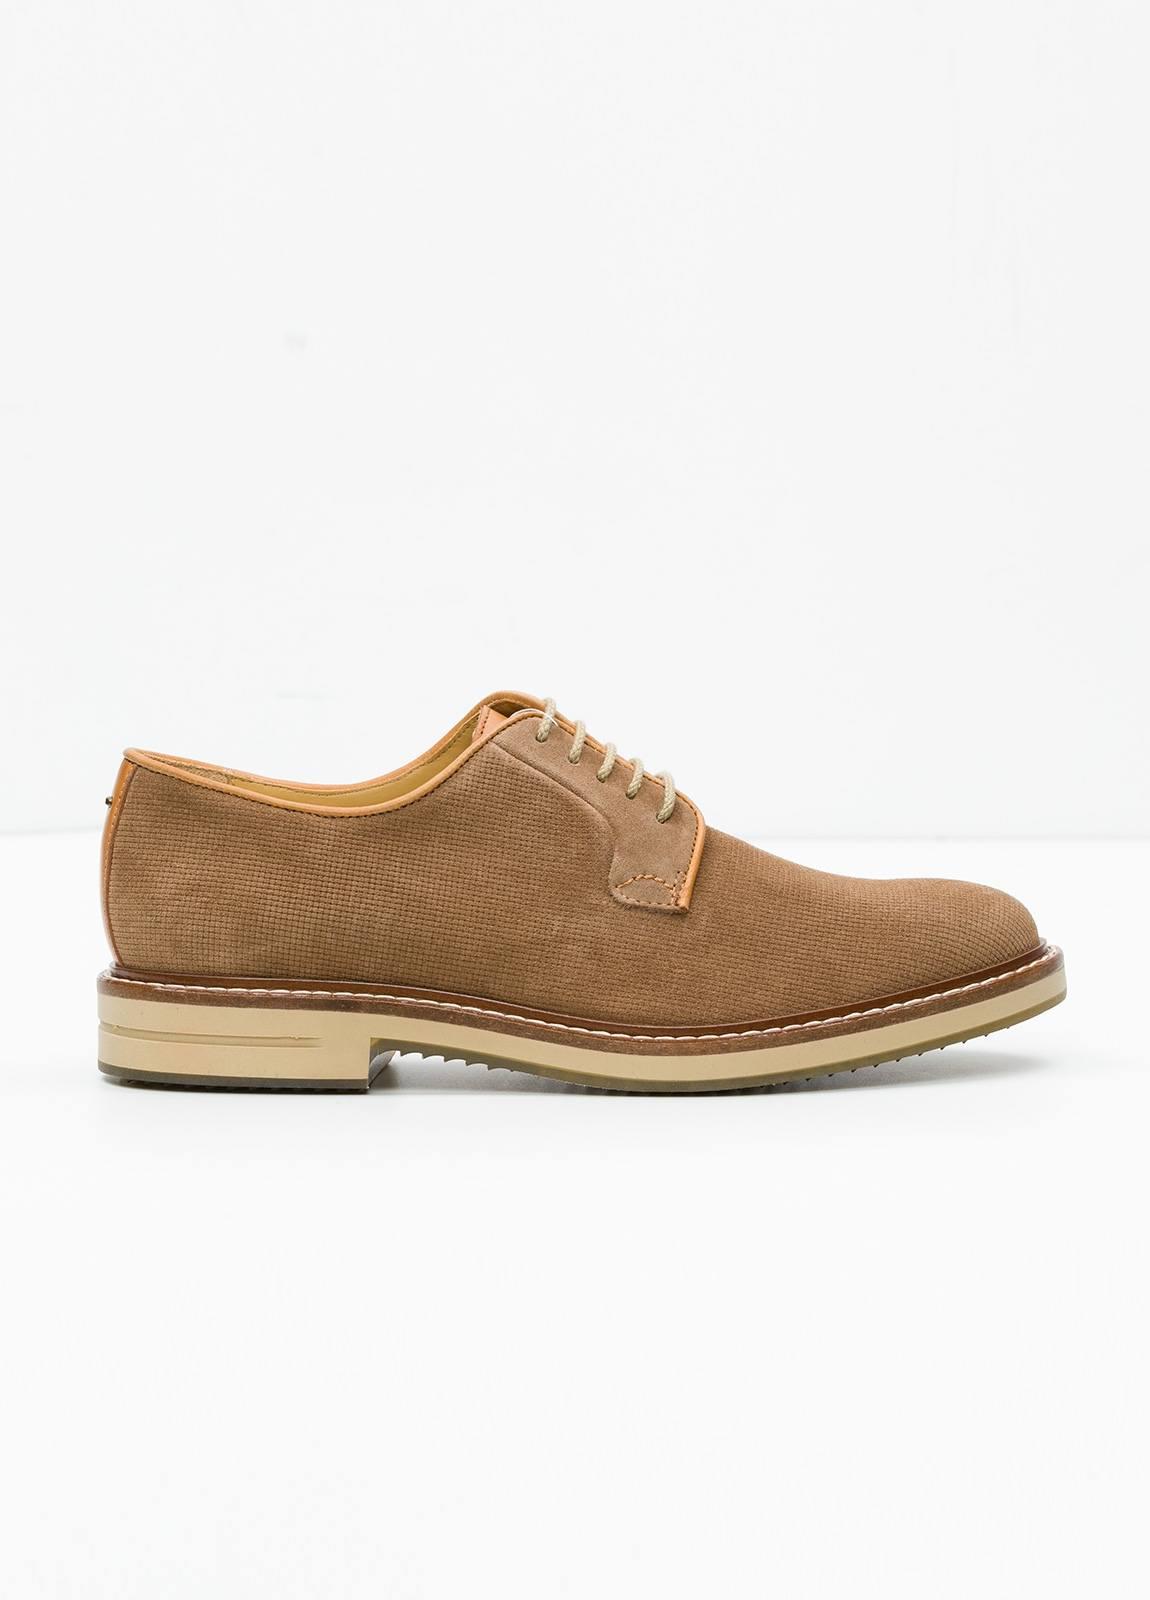 Zapato Sport Wear color tostado. 100% Serraje.